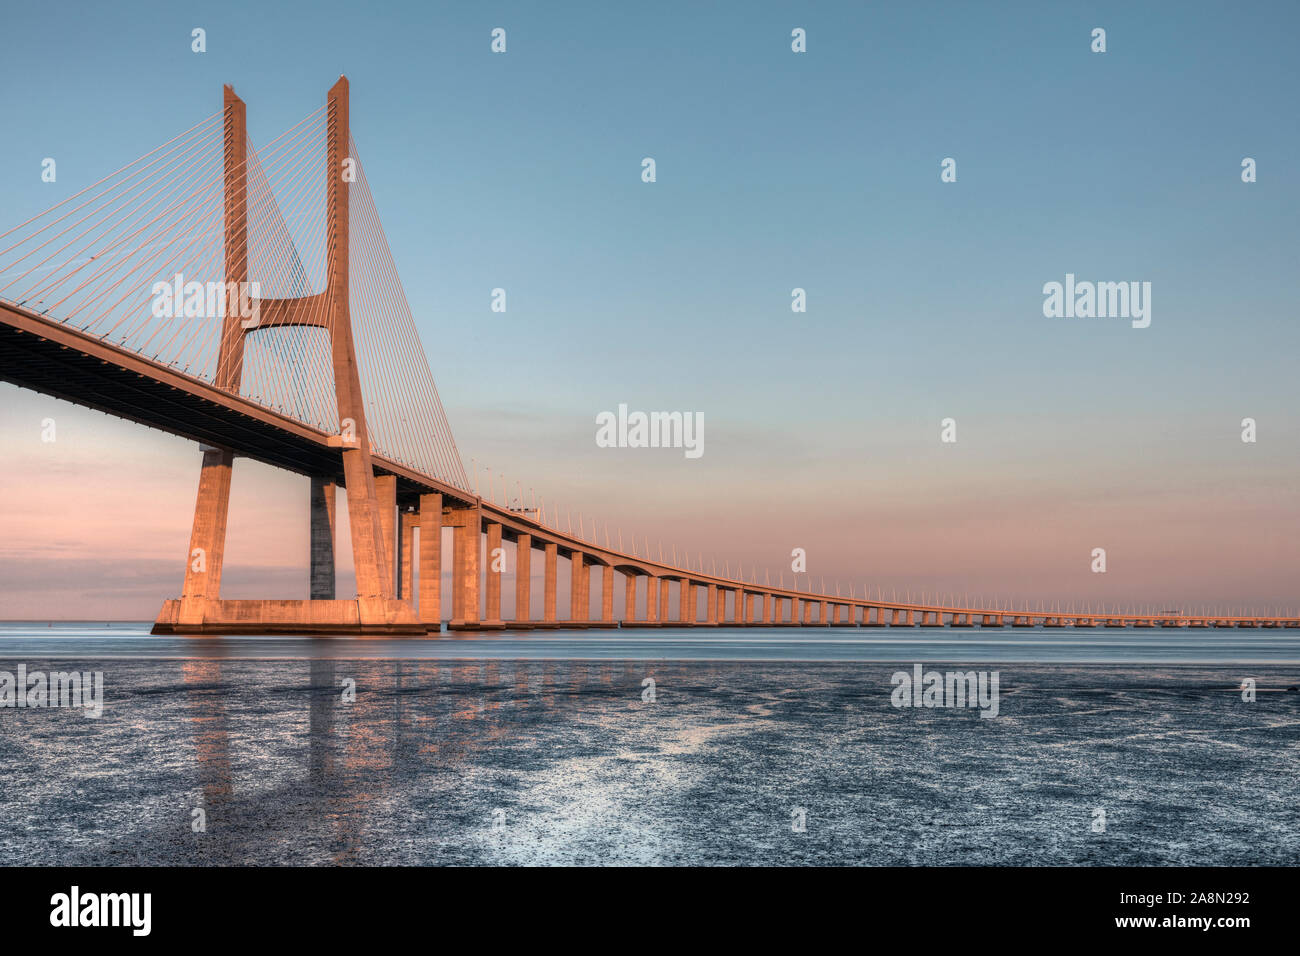 Vasco da Gama Bridge, Lisbon, Portugal, Europe Stock Photo